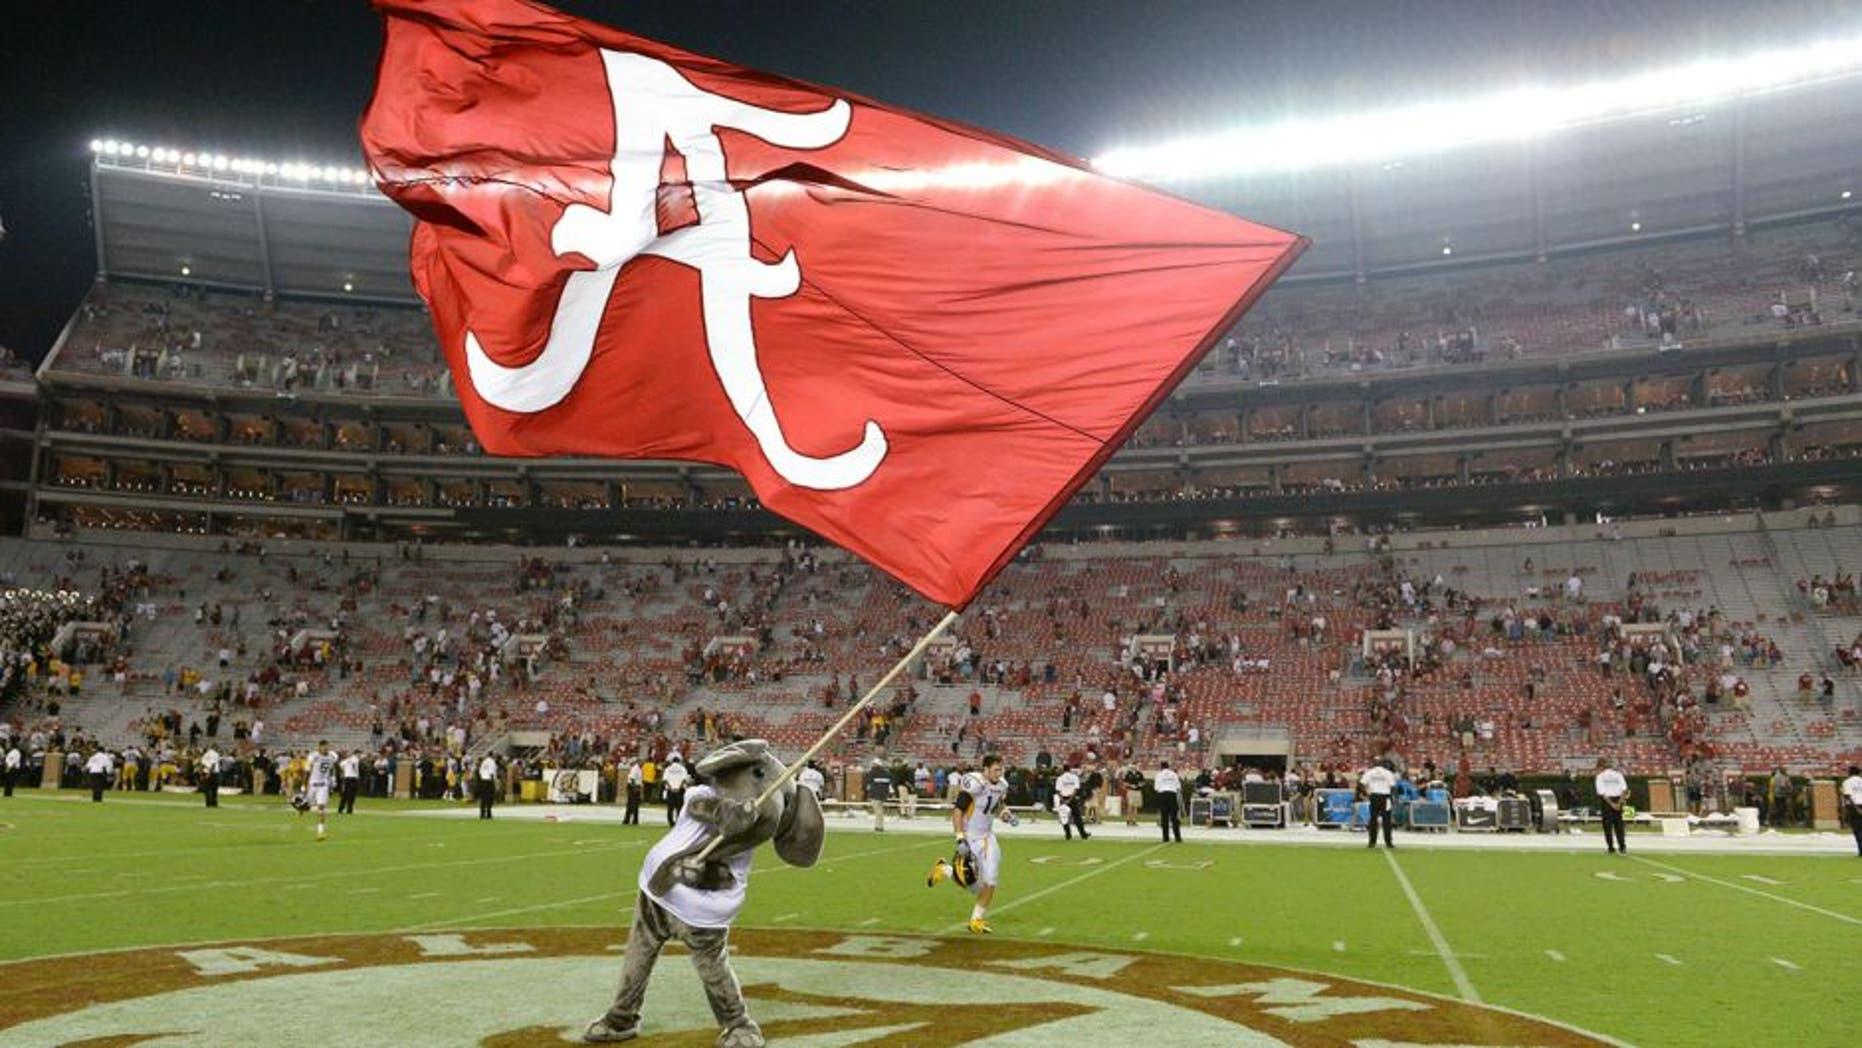 Sep 13, 2014; Tuscaloosa, AL, USA; Alabama Crimson Tide mascot Big Al waves the Alabama flag following their 52-12 victory against the Southern Miss Golden Eagles at Bryant-Denny Stadium. Mandatory Credit: John David Mercer-USA TODAY Sports